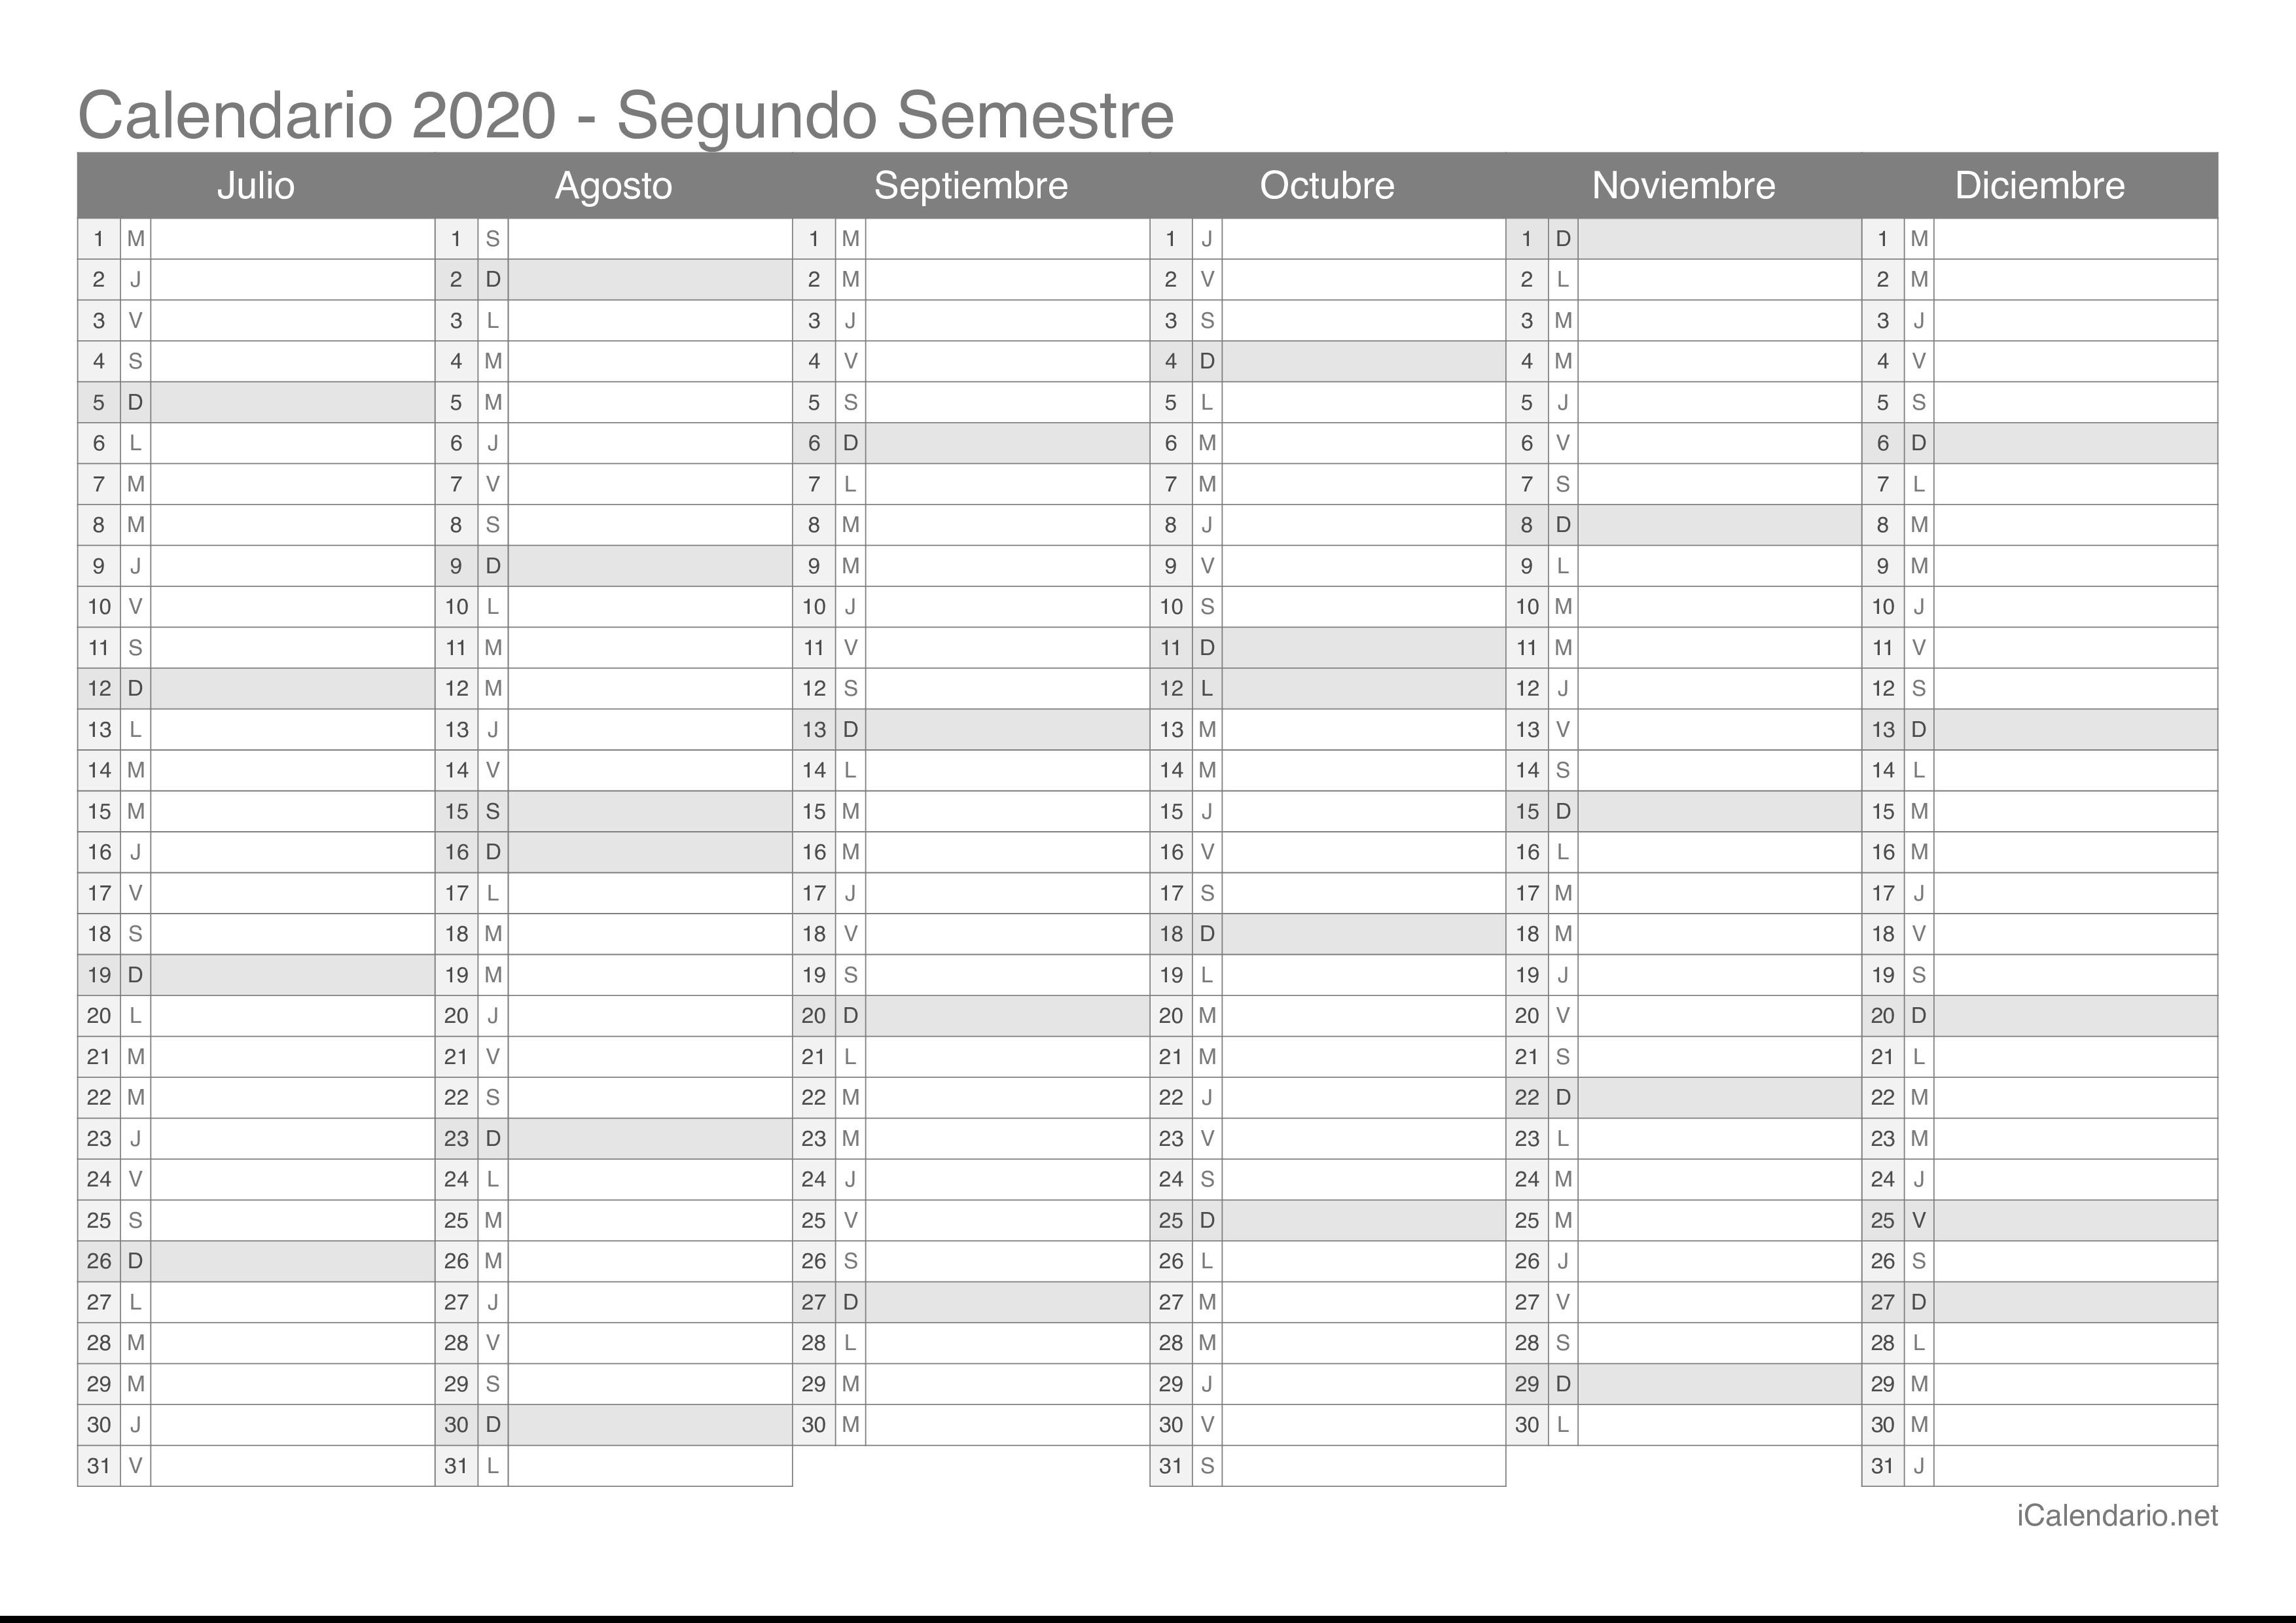 calendario 2020 semestral blanco semestre 2